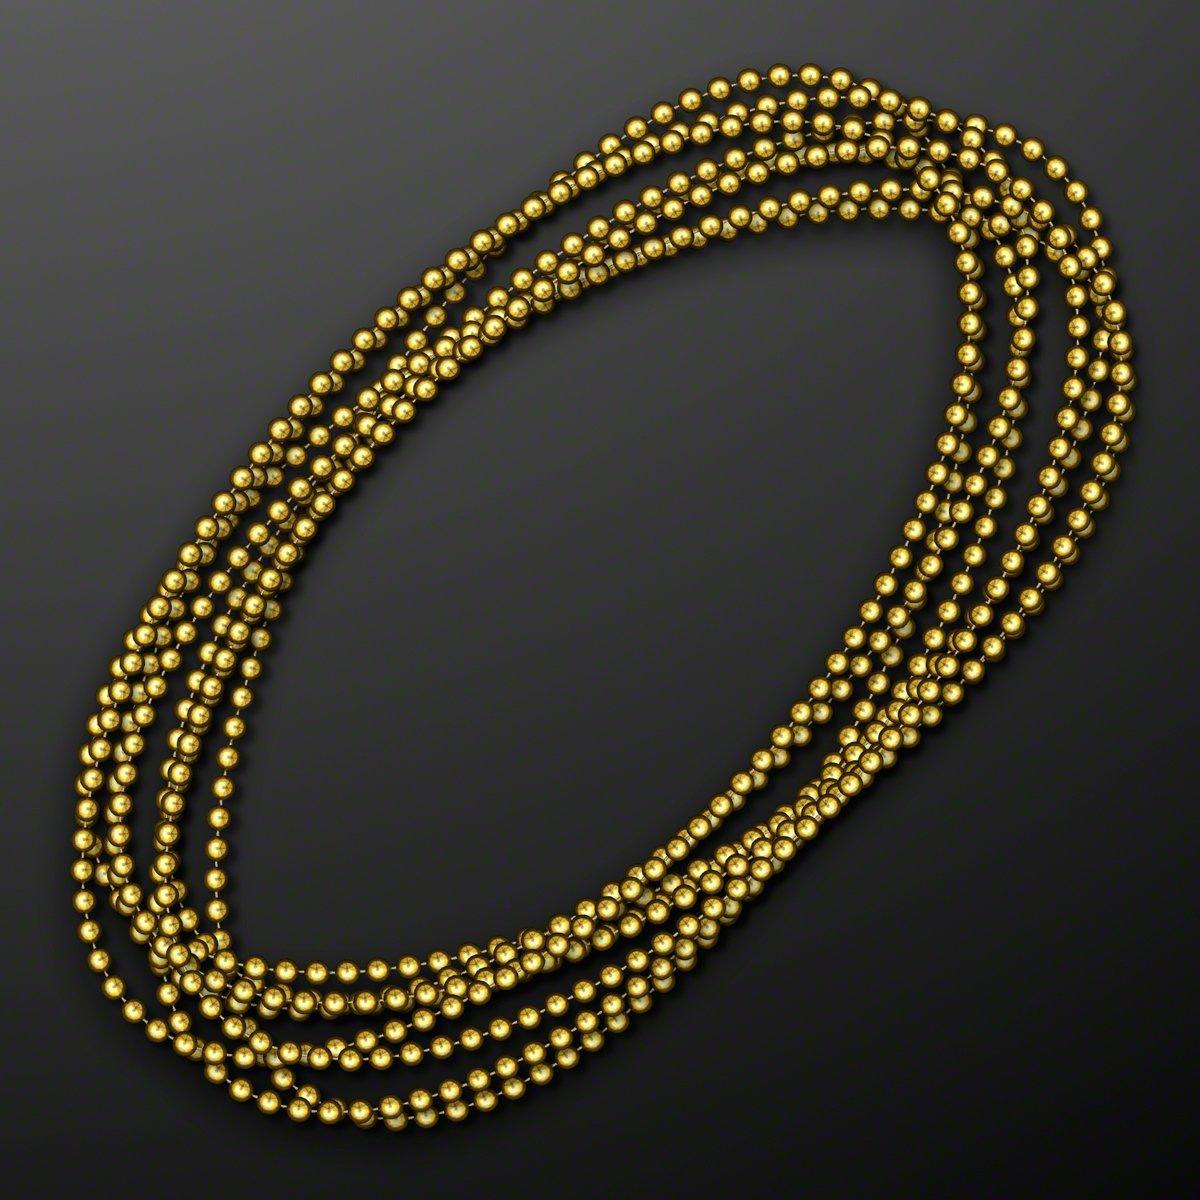 FlashingBlinkyLights Gold Round Ball Mardi Gras Bead Necklaces (Set of 144)